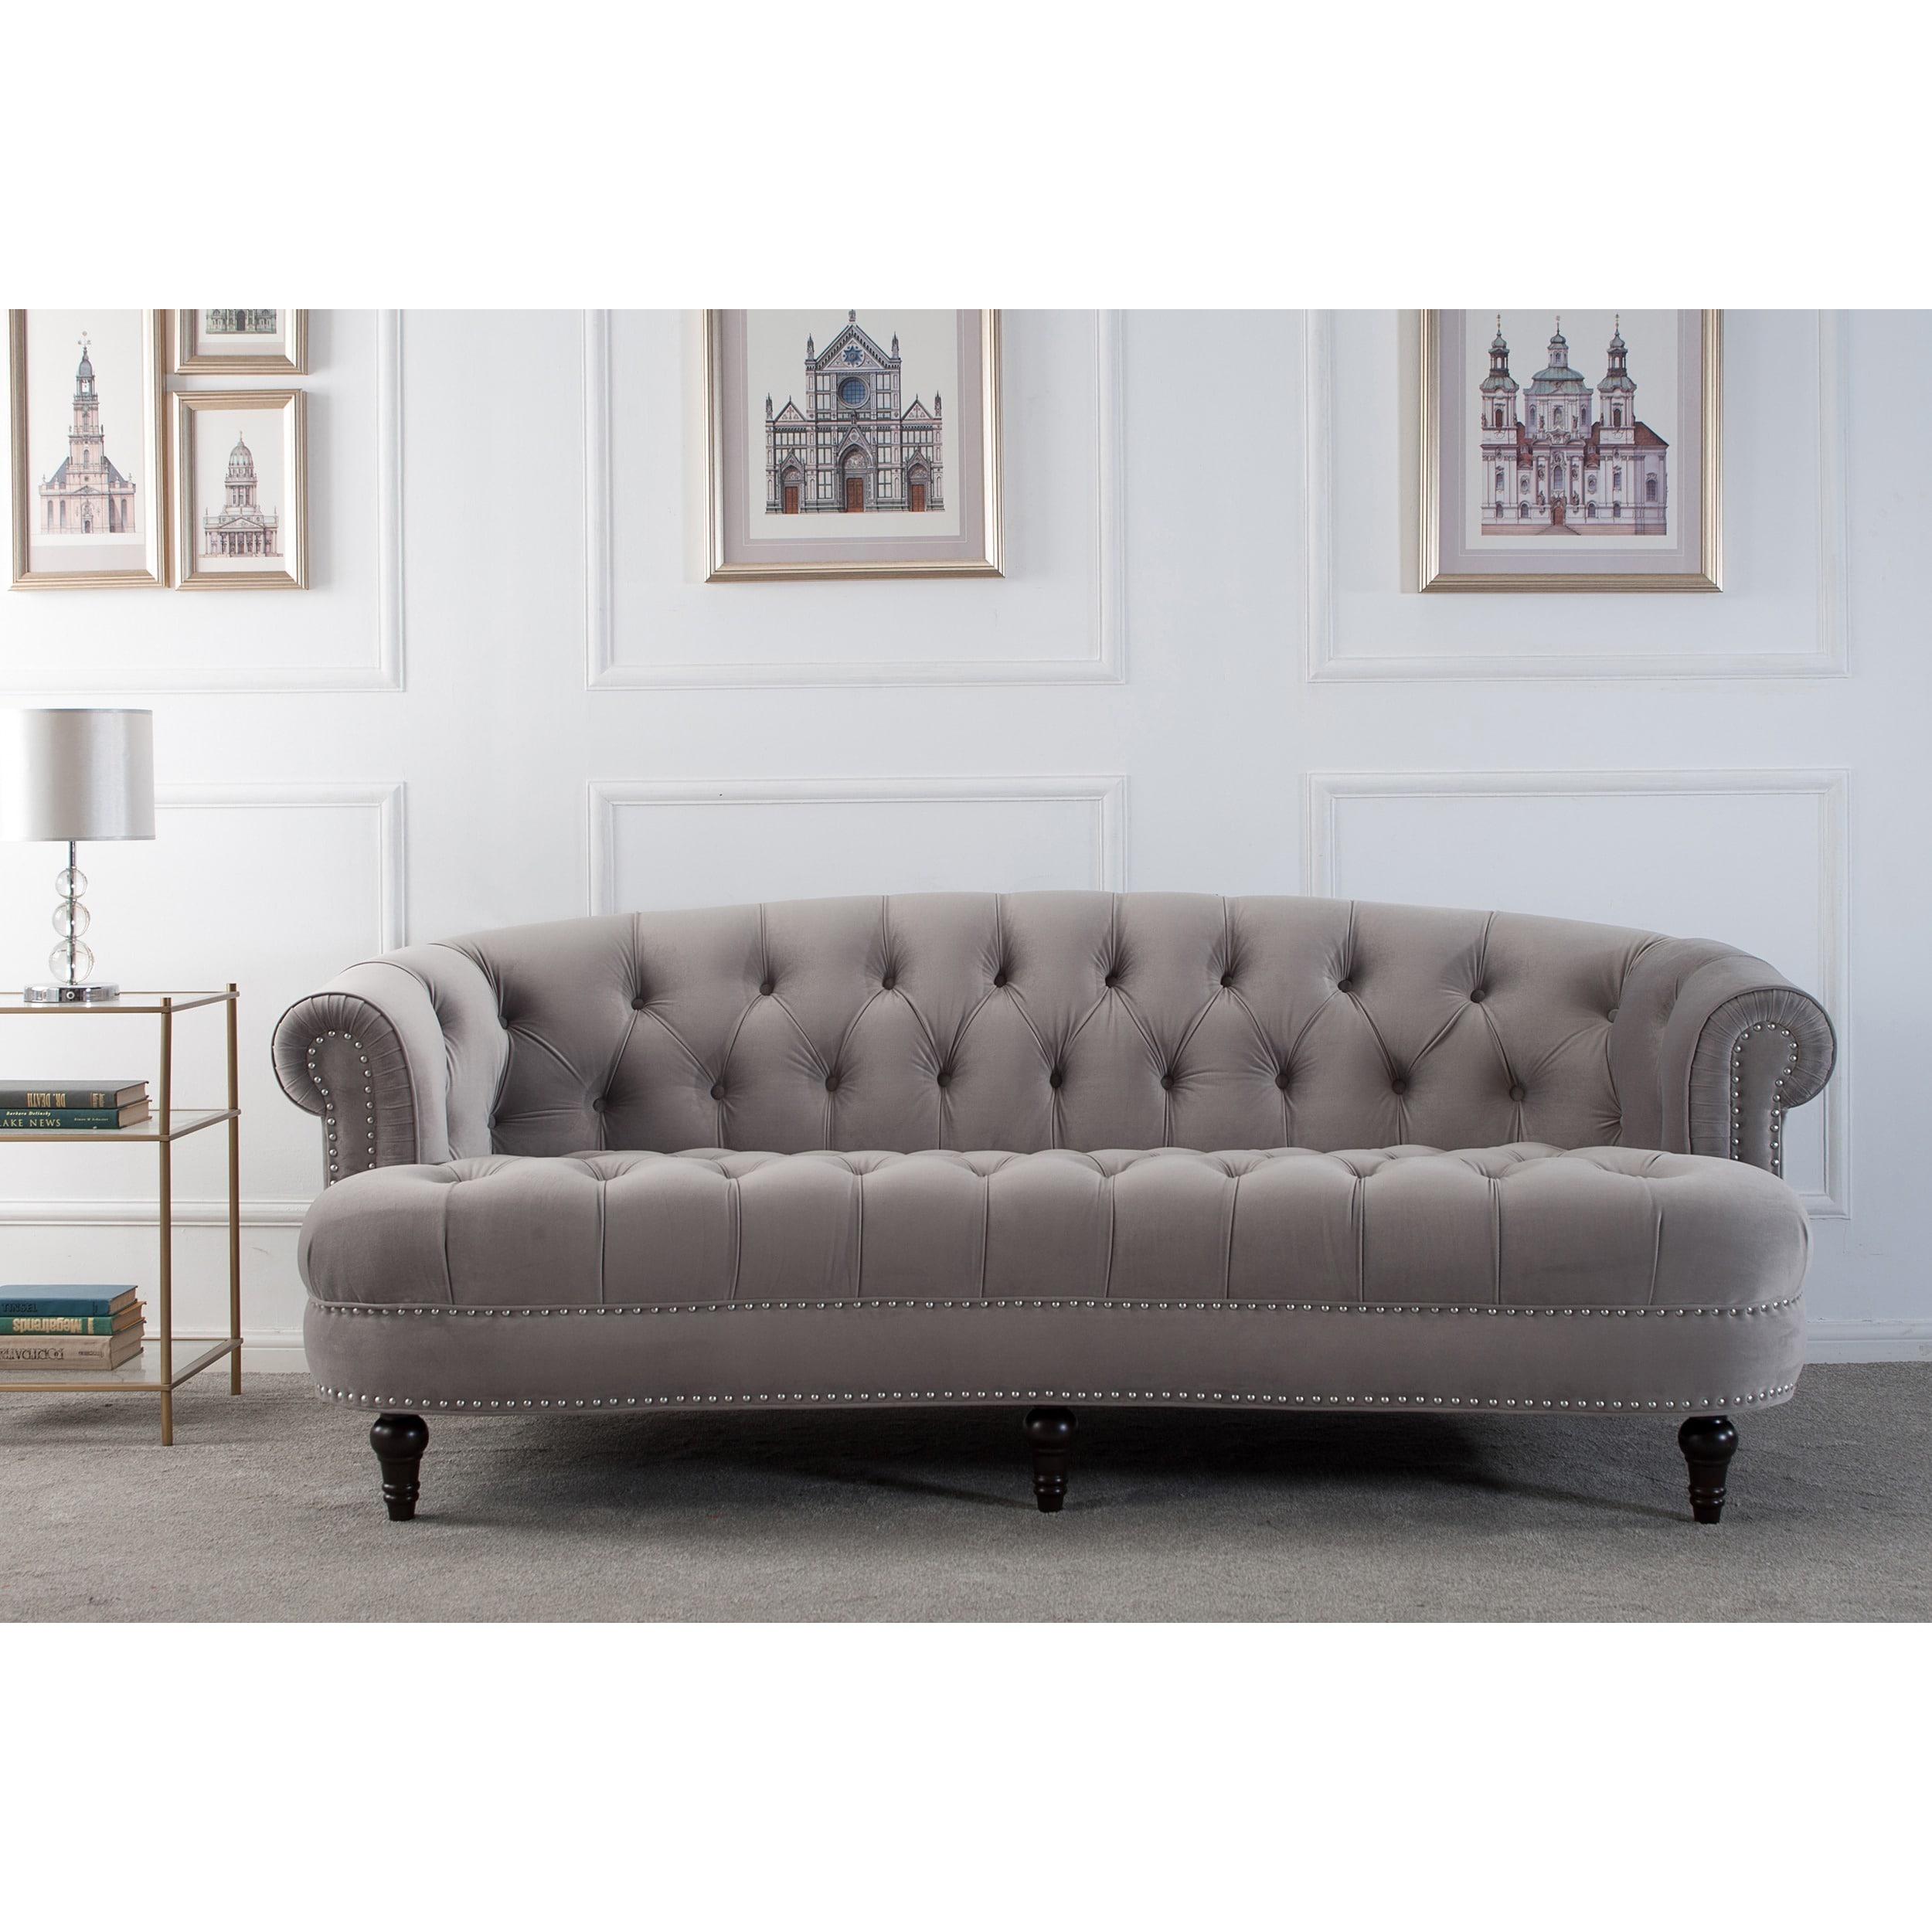 Chesterfield Sofa Ebay Leather Sectional Sofa